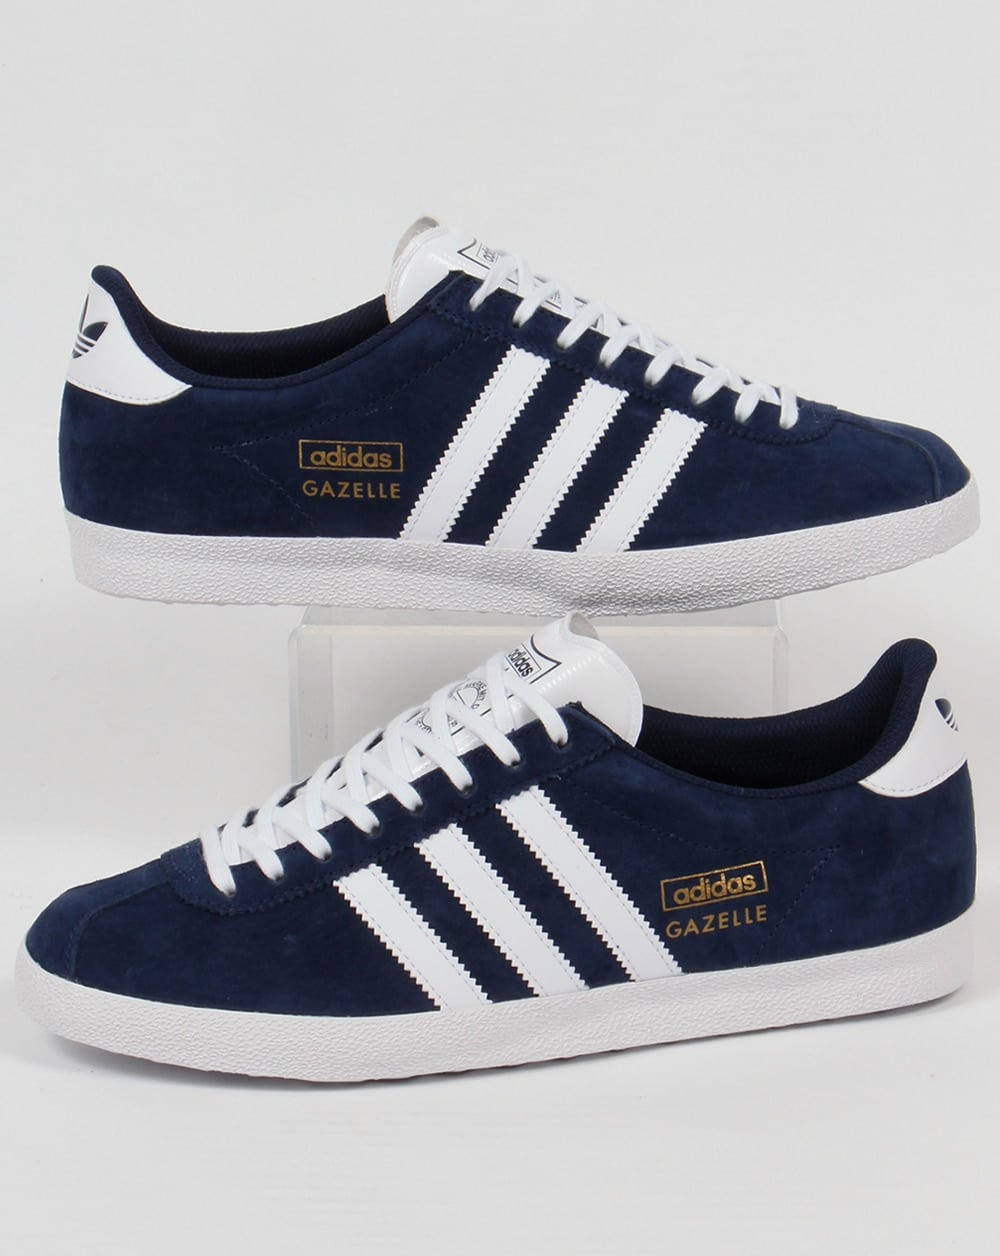 Adidas Originals Gazelle Men/'s Classic Casual Retro Vintage Trainers Navy